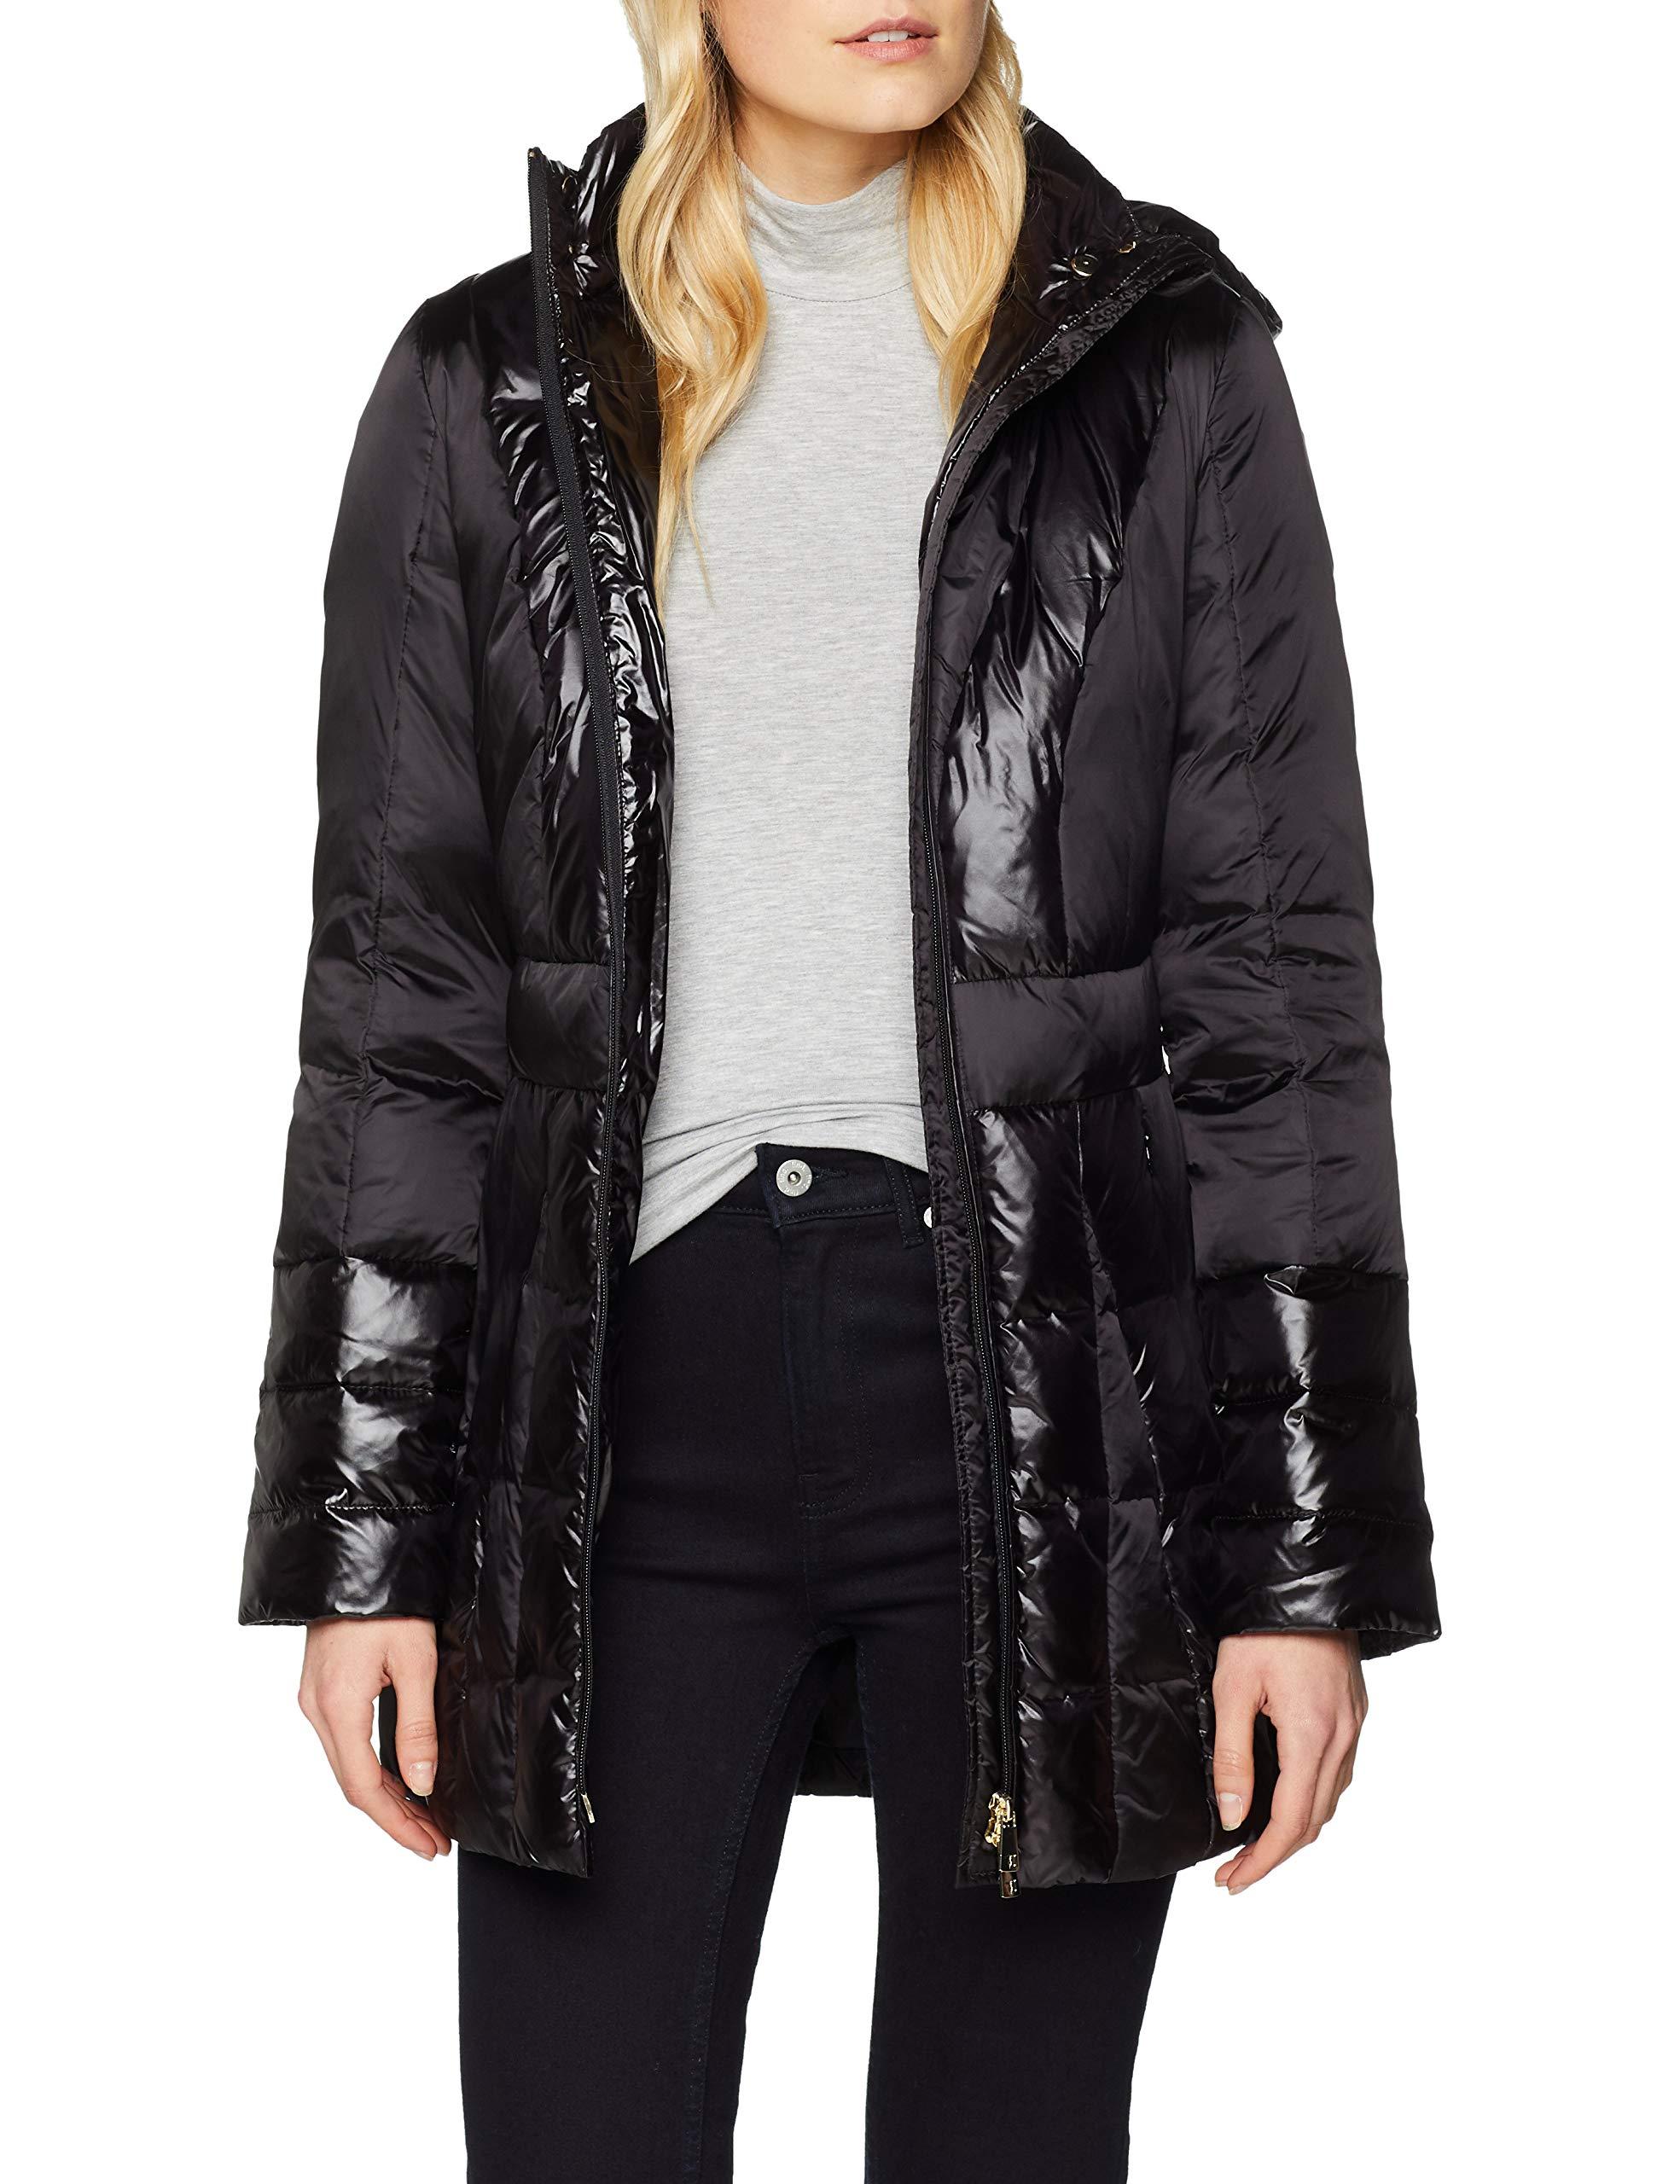 Trussardi Jeans Fit Hood Slim ManteauNoirblack Coat Whith Femme K29940 vy0m8nOwN